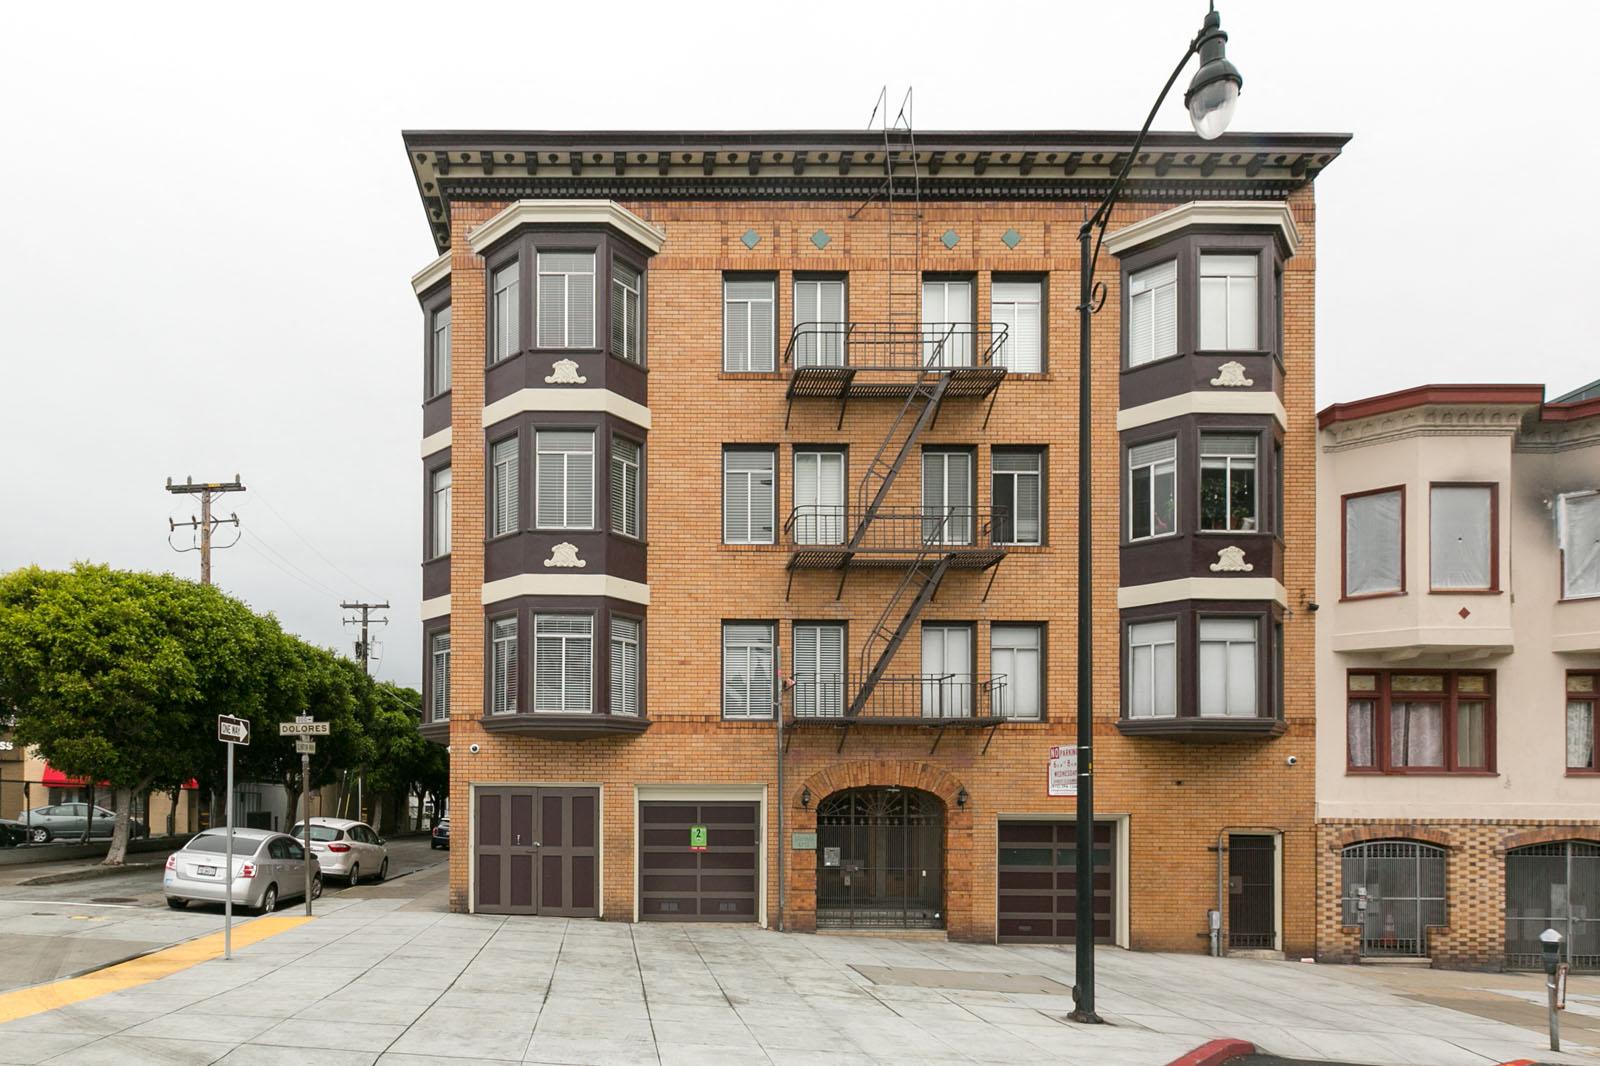 San Francisco photogallery 1